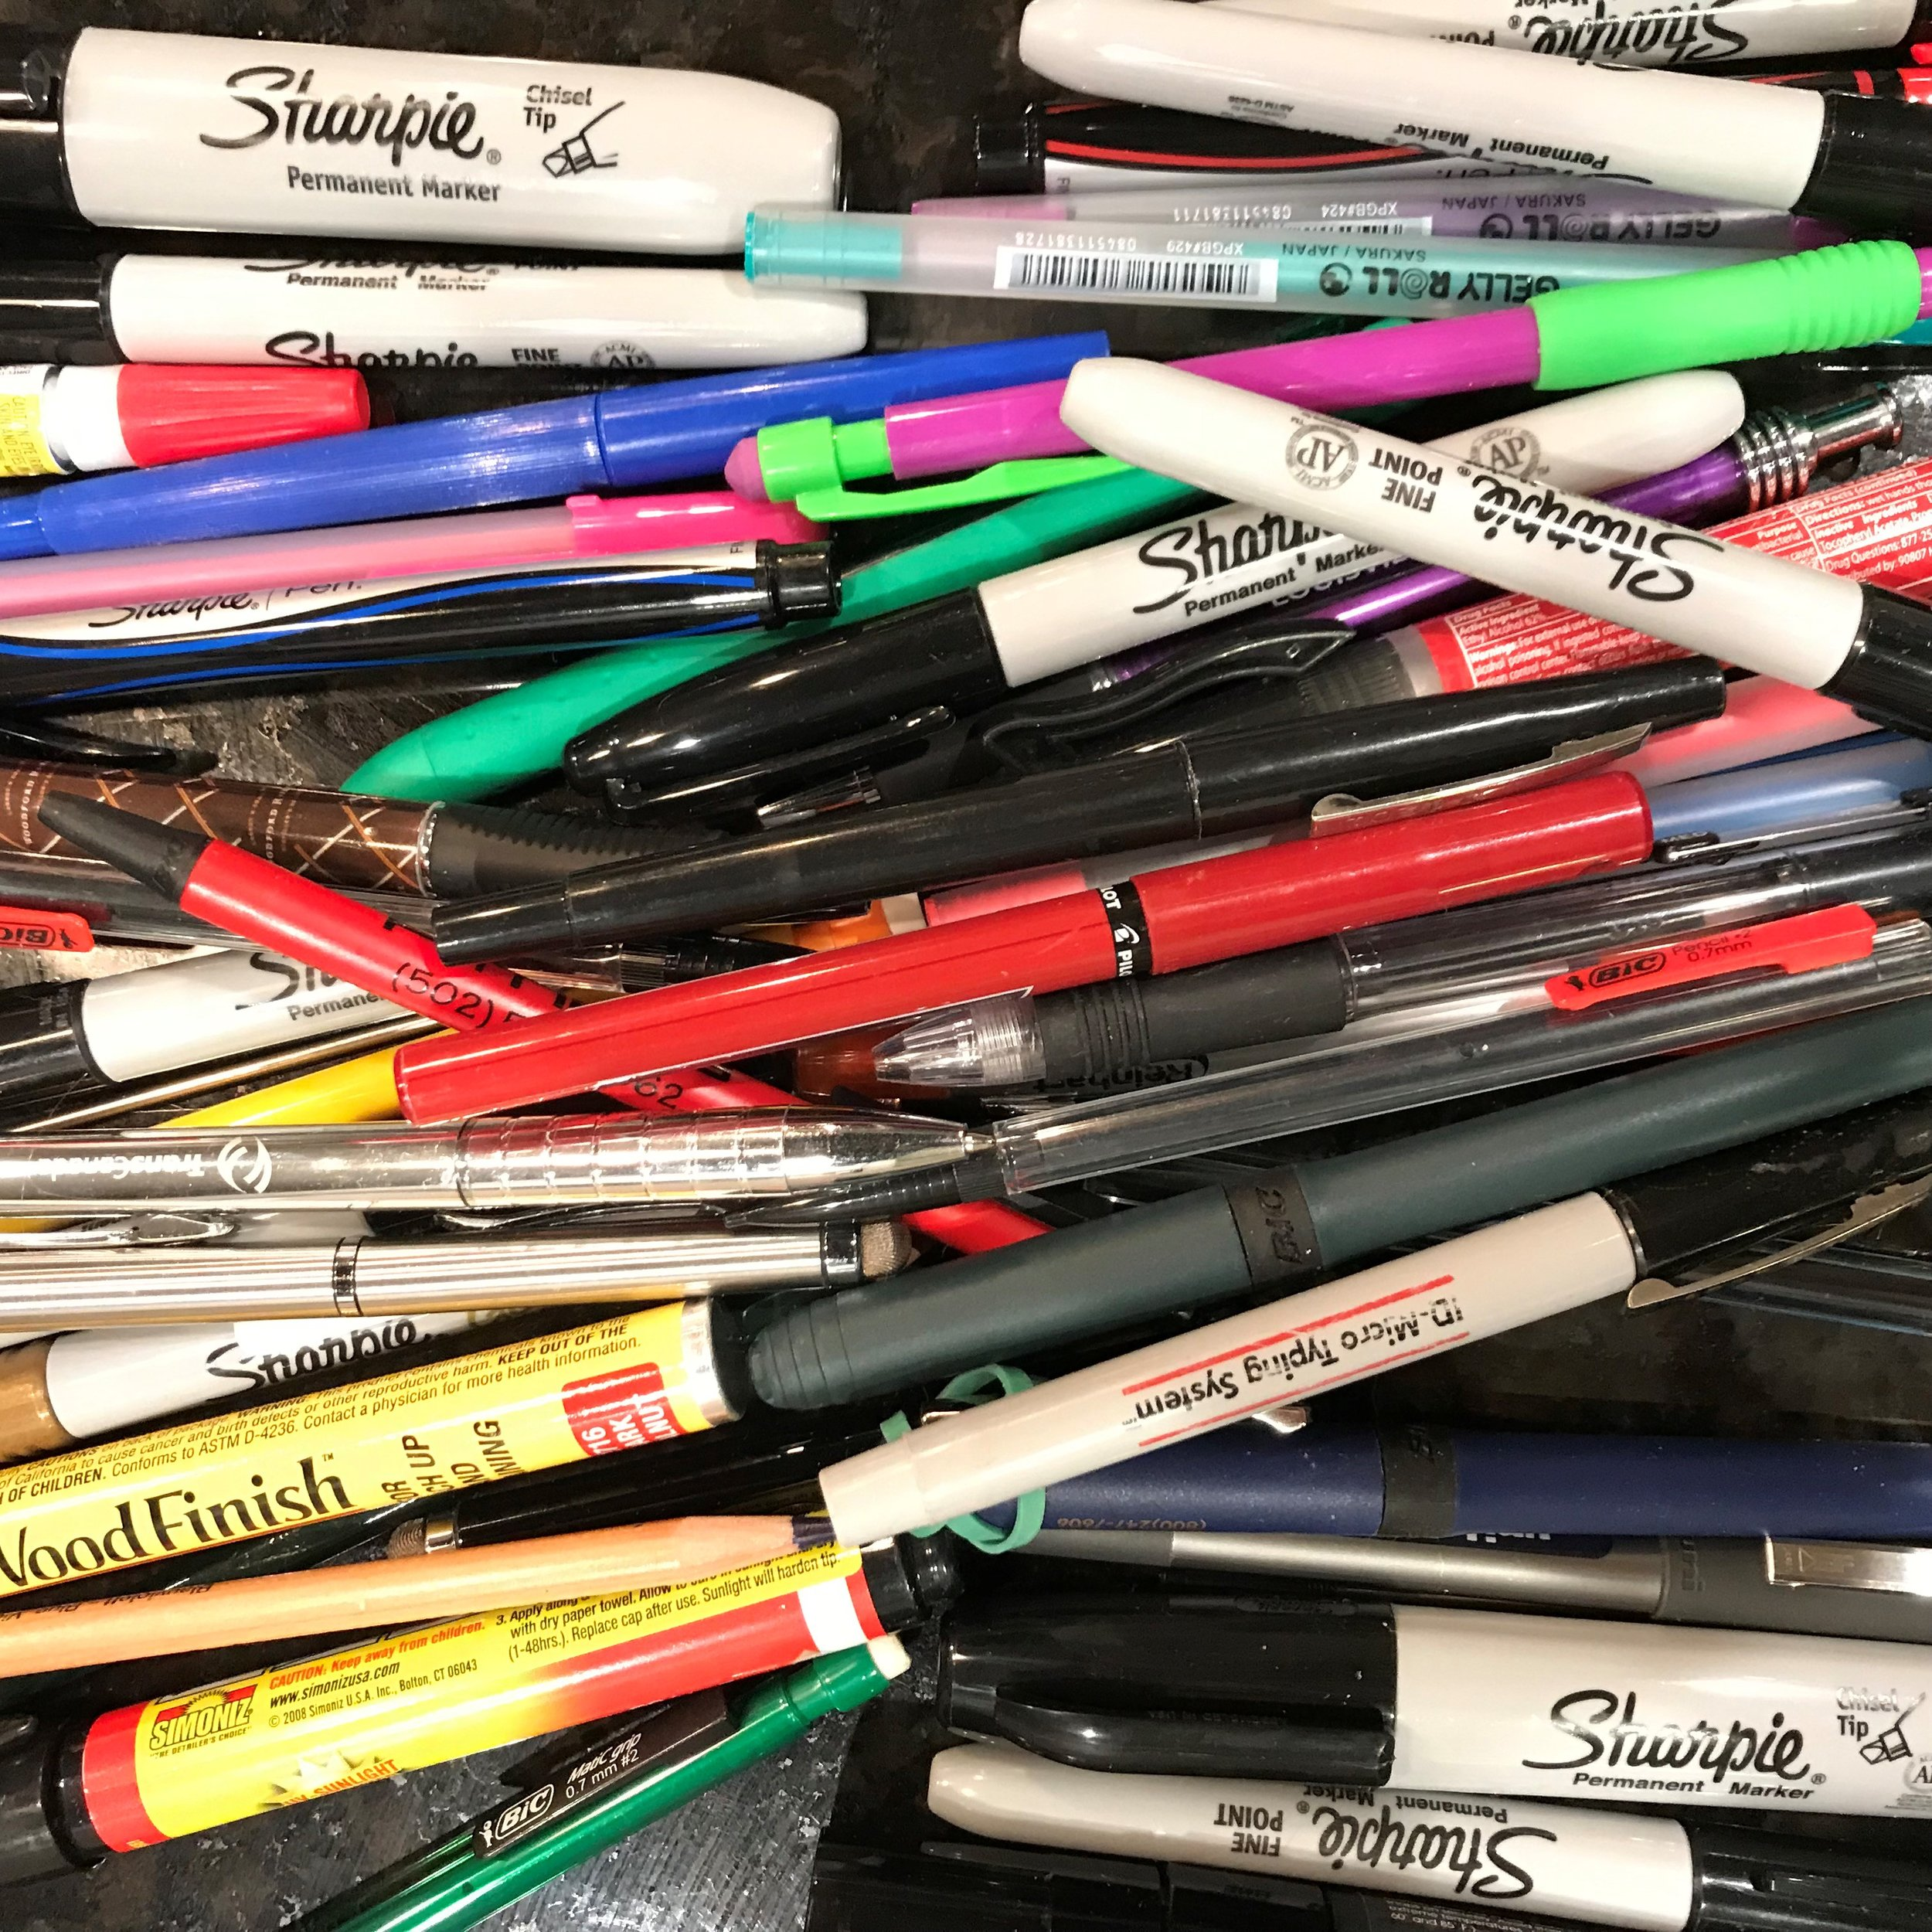 Who knew I had so many pens and markers?!?